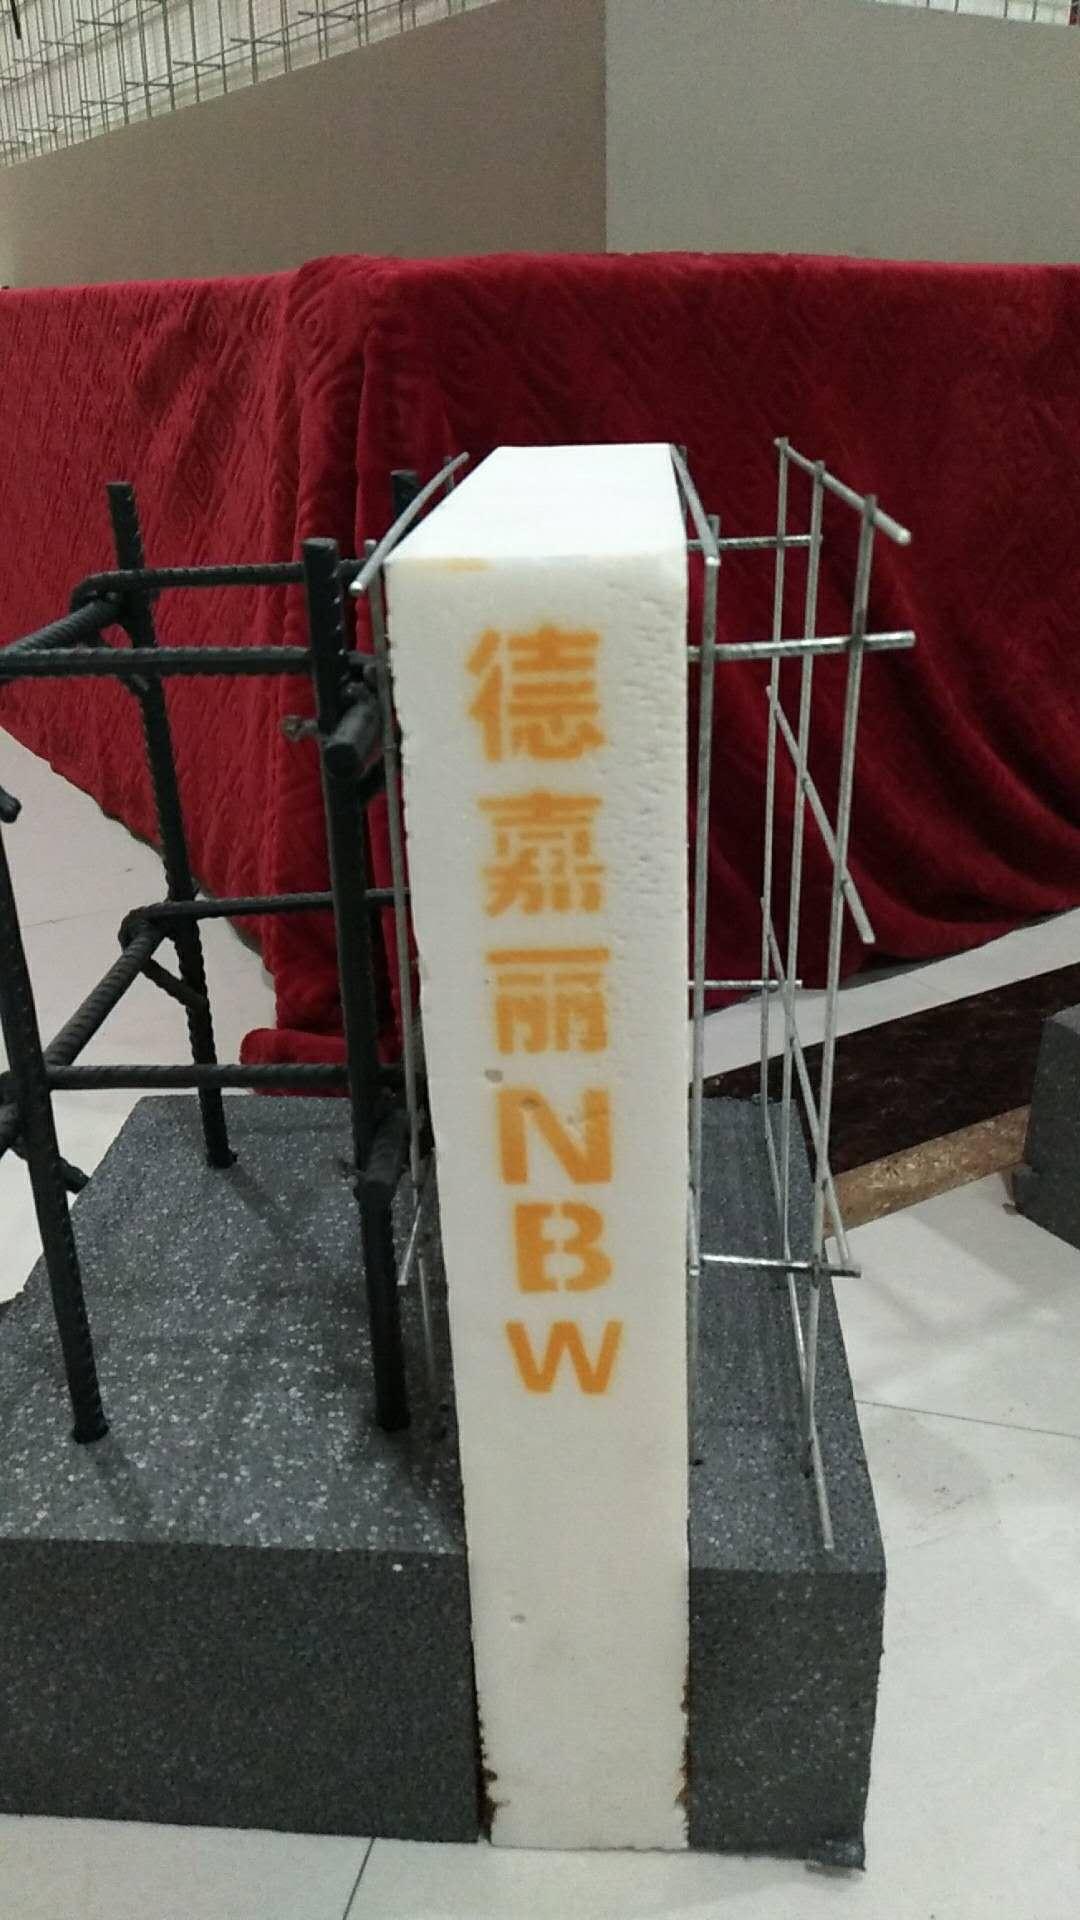 NBW现浇<em style='color:red'>混凝土</em>内置保温体系图片